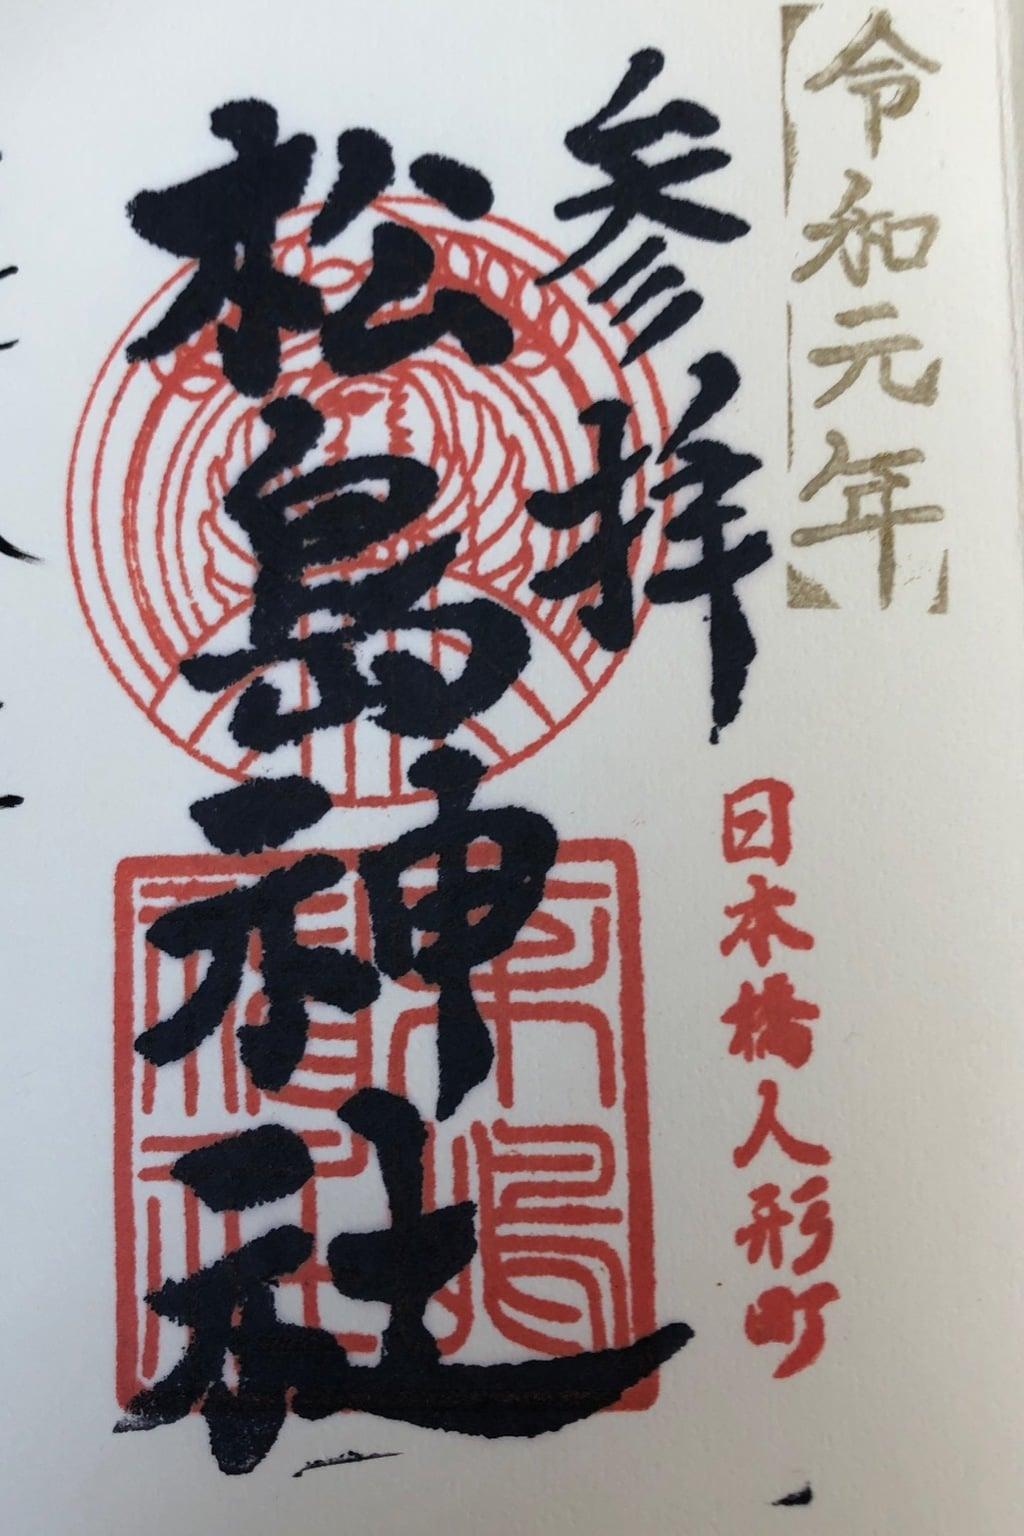 松島神社の御朱印